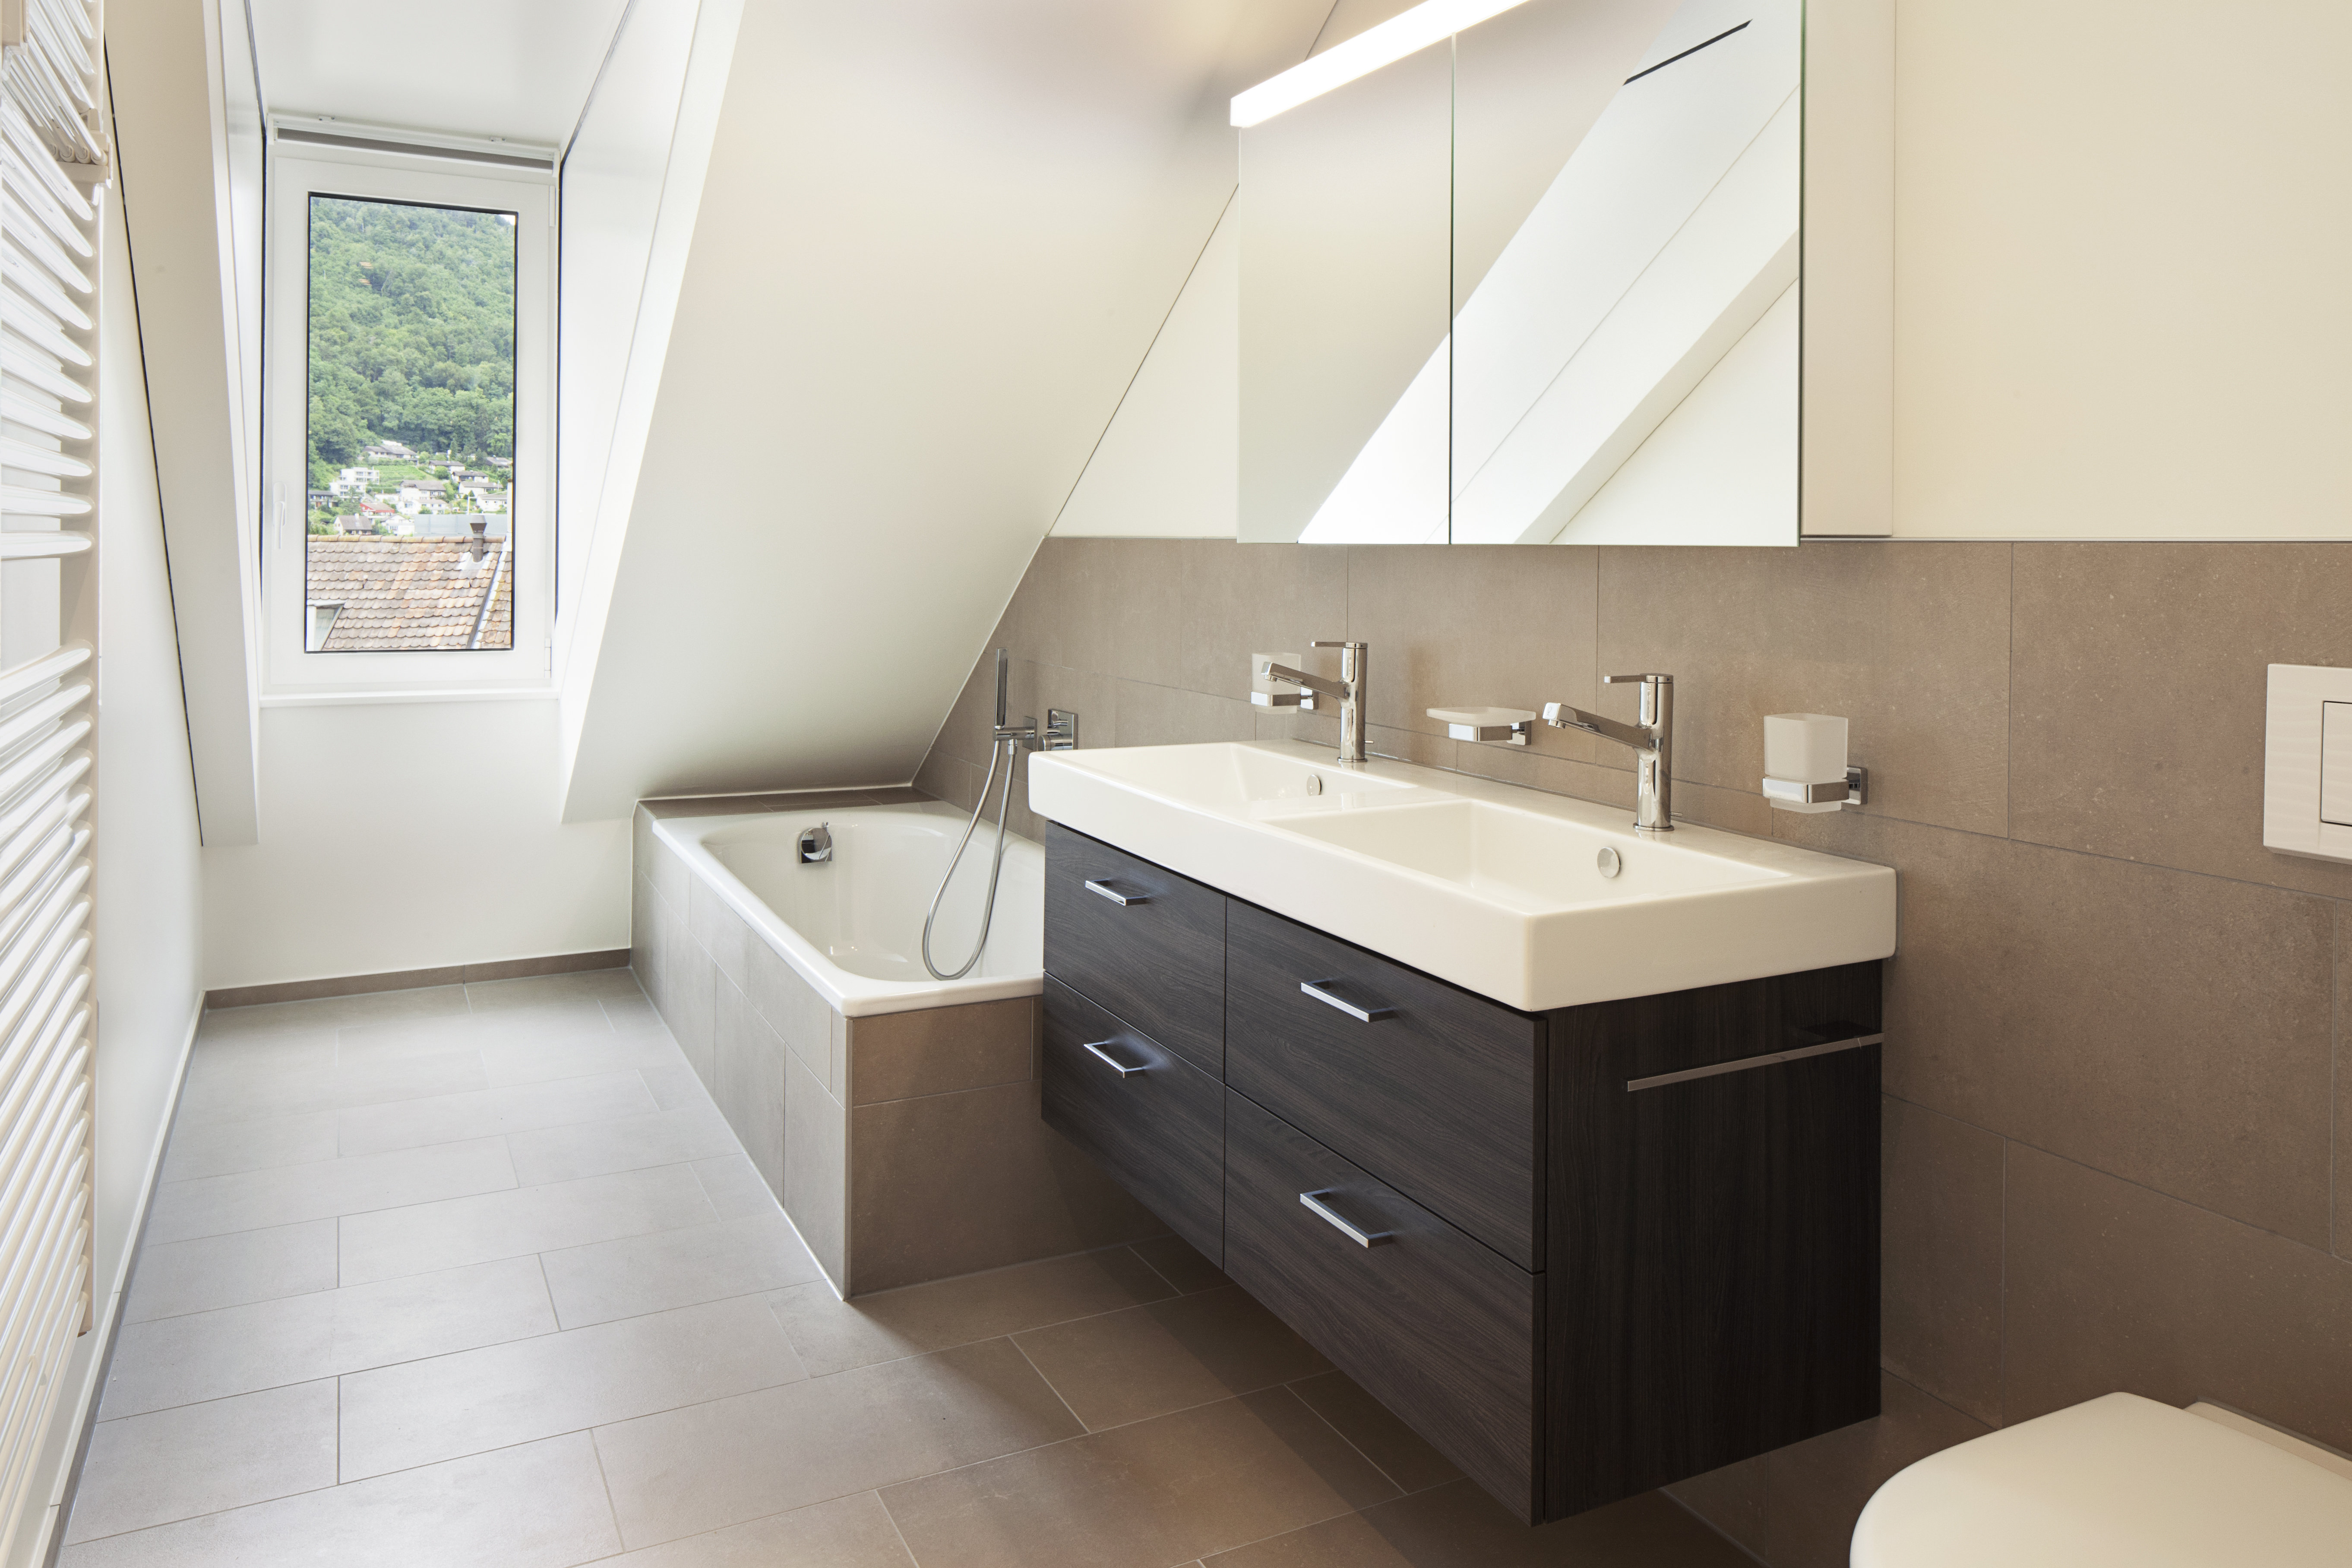 Wohnung Kueffi Center Liestal Badezimmer ERLA